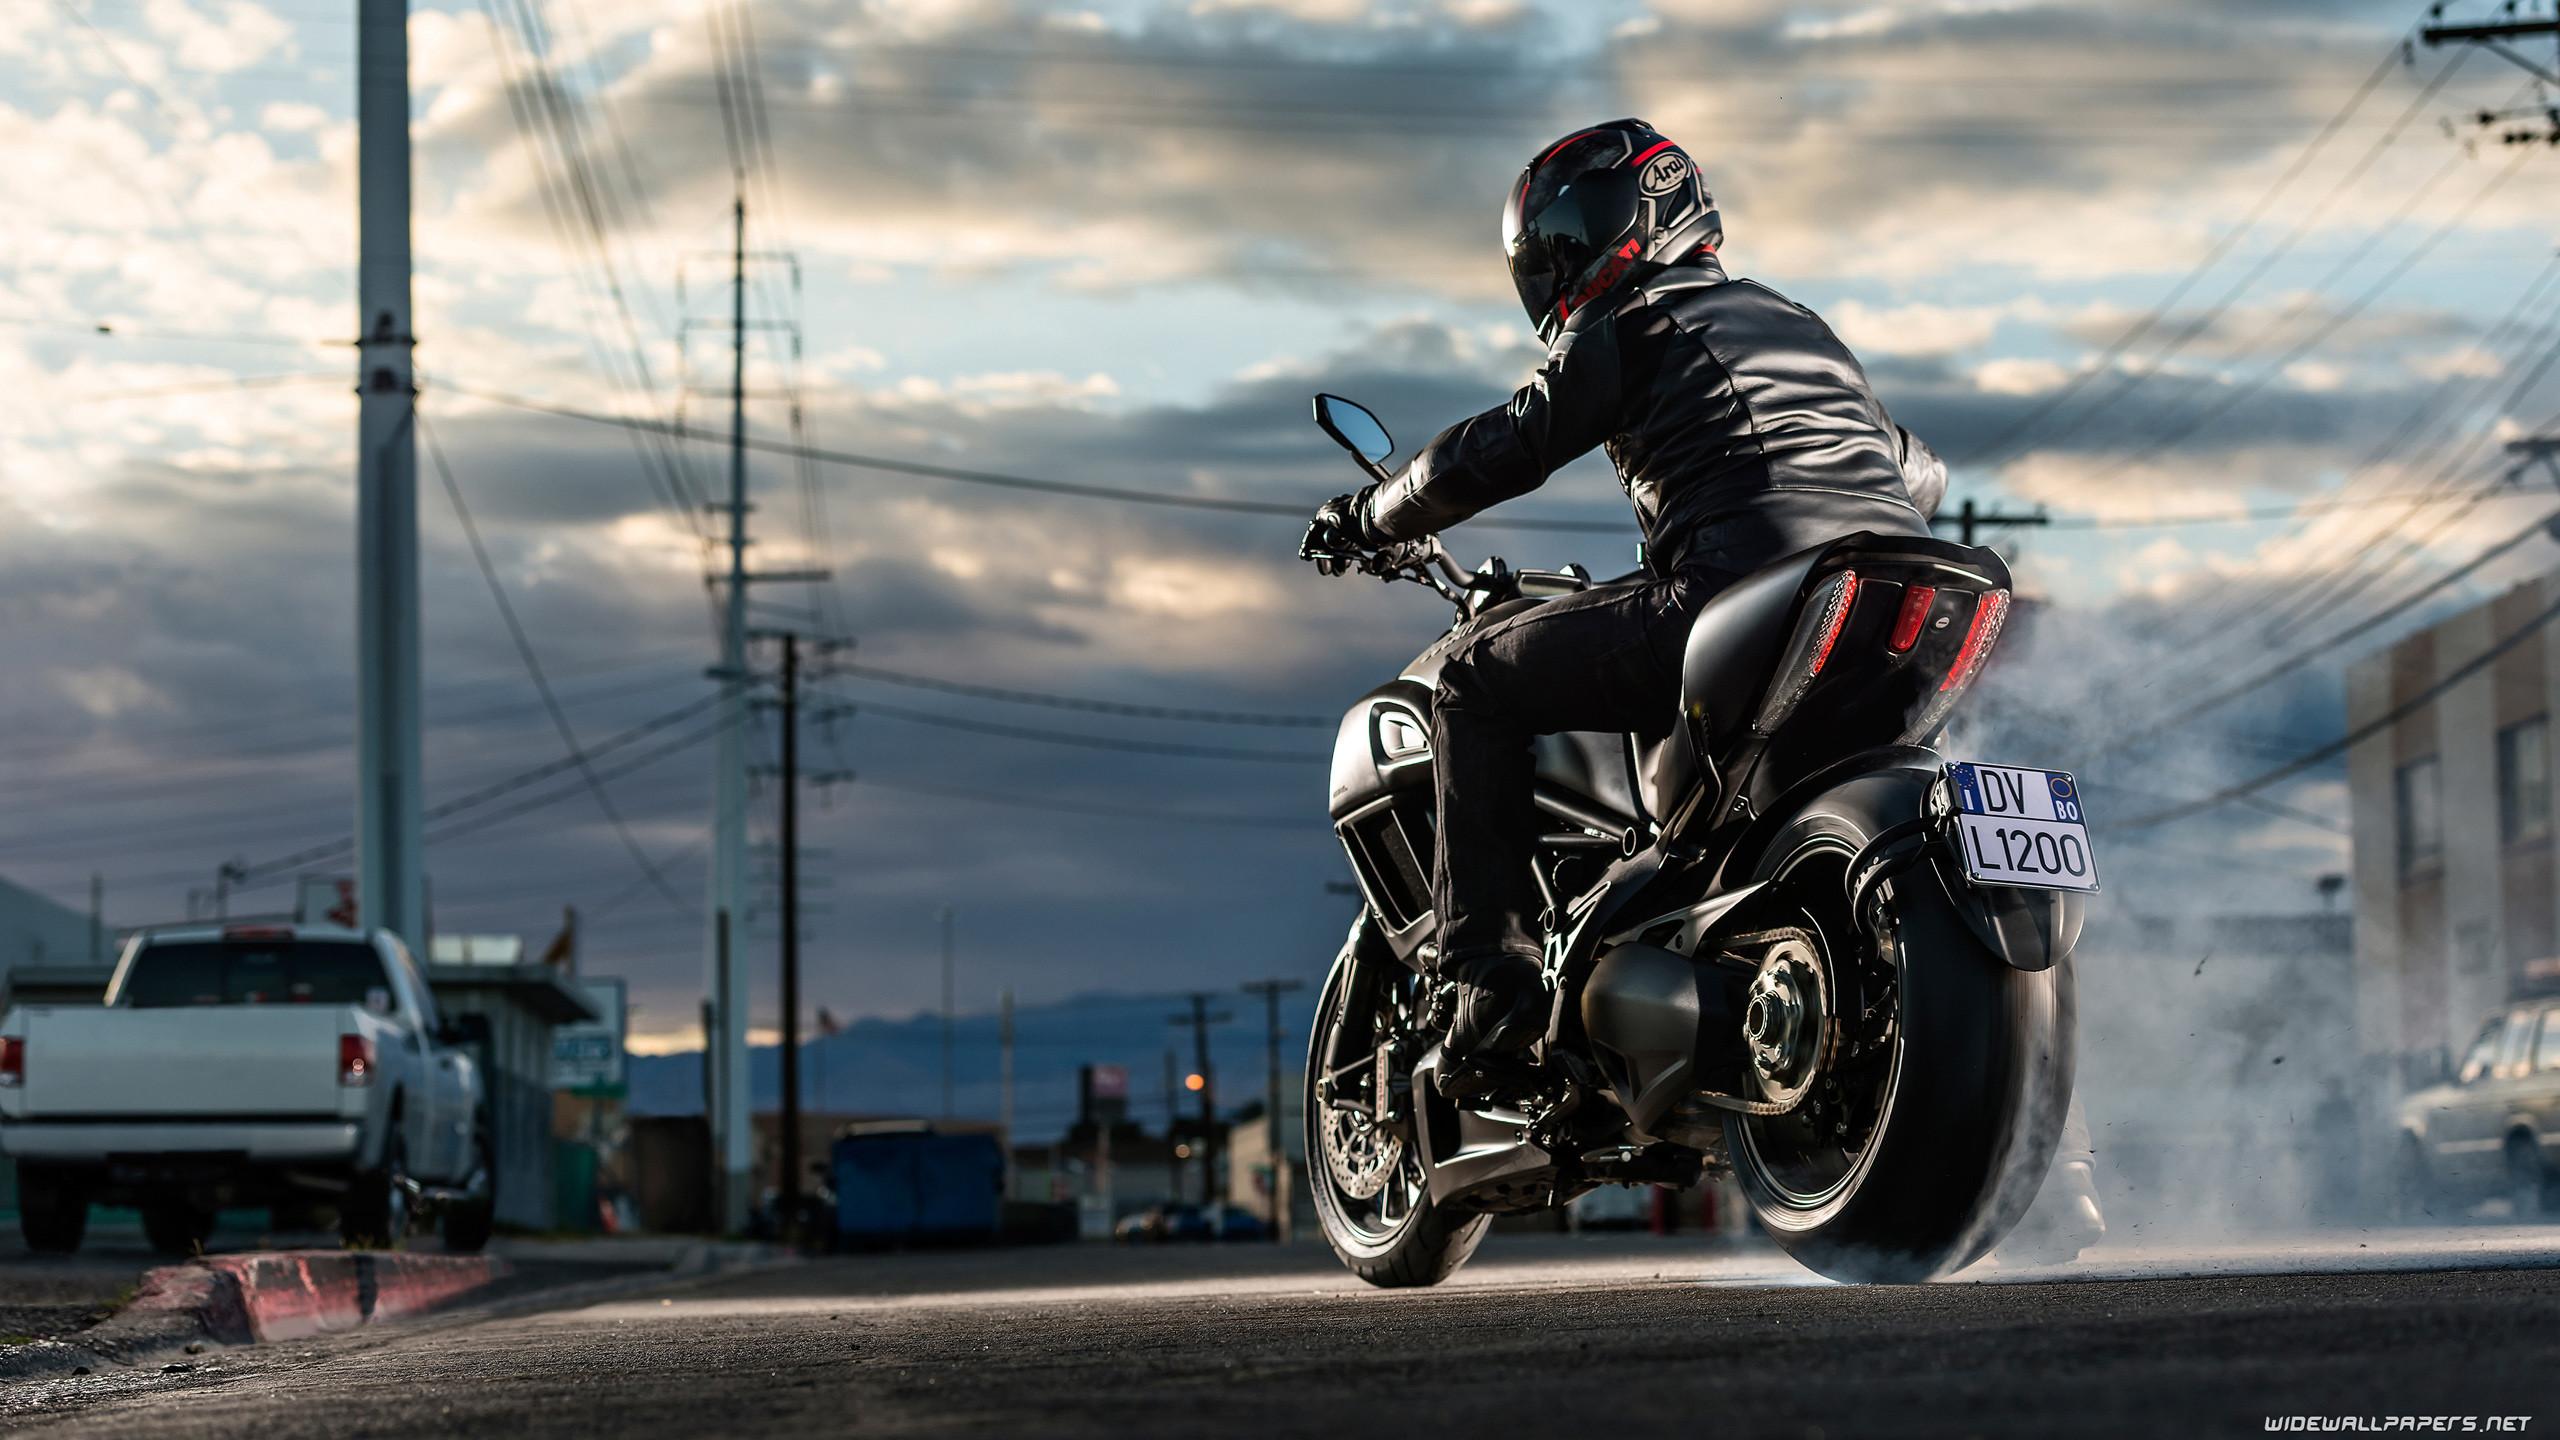 Ducati Diavel motorcycle wallpapers 4K Ultra HD Ducati Diavel motorcycle  2560×1600 3840×2160